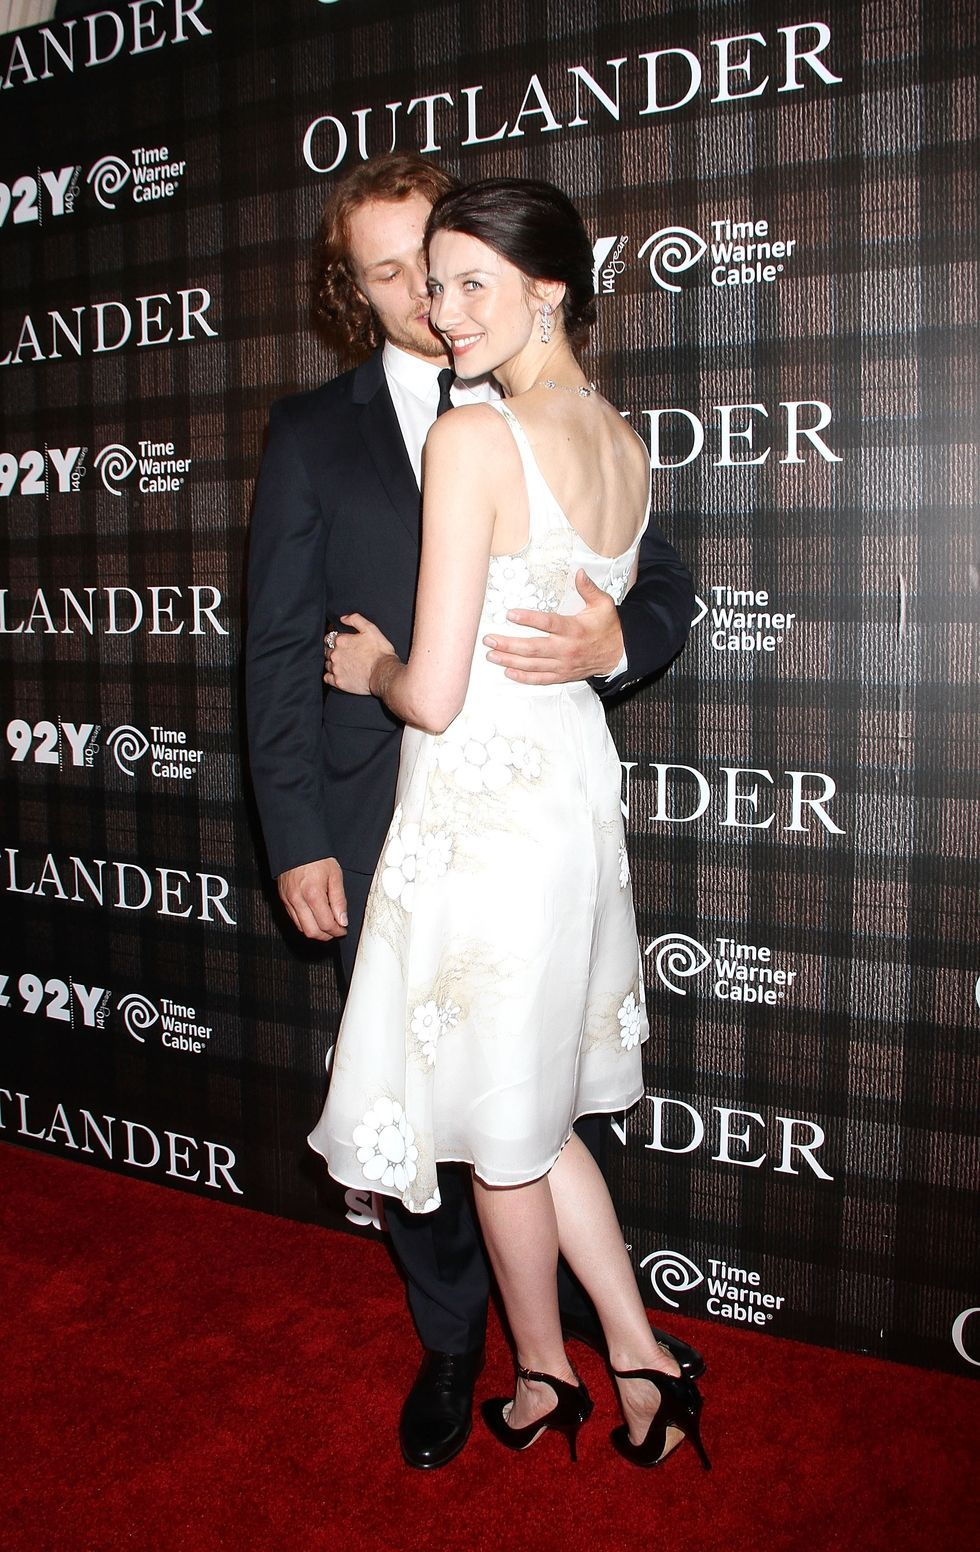 Outlander sam and caitriona dating